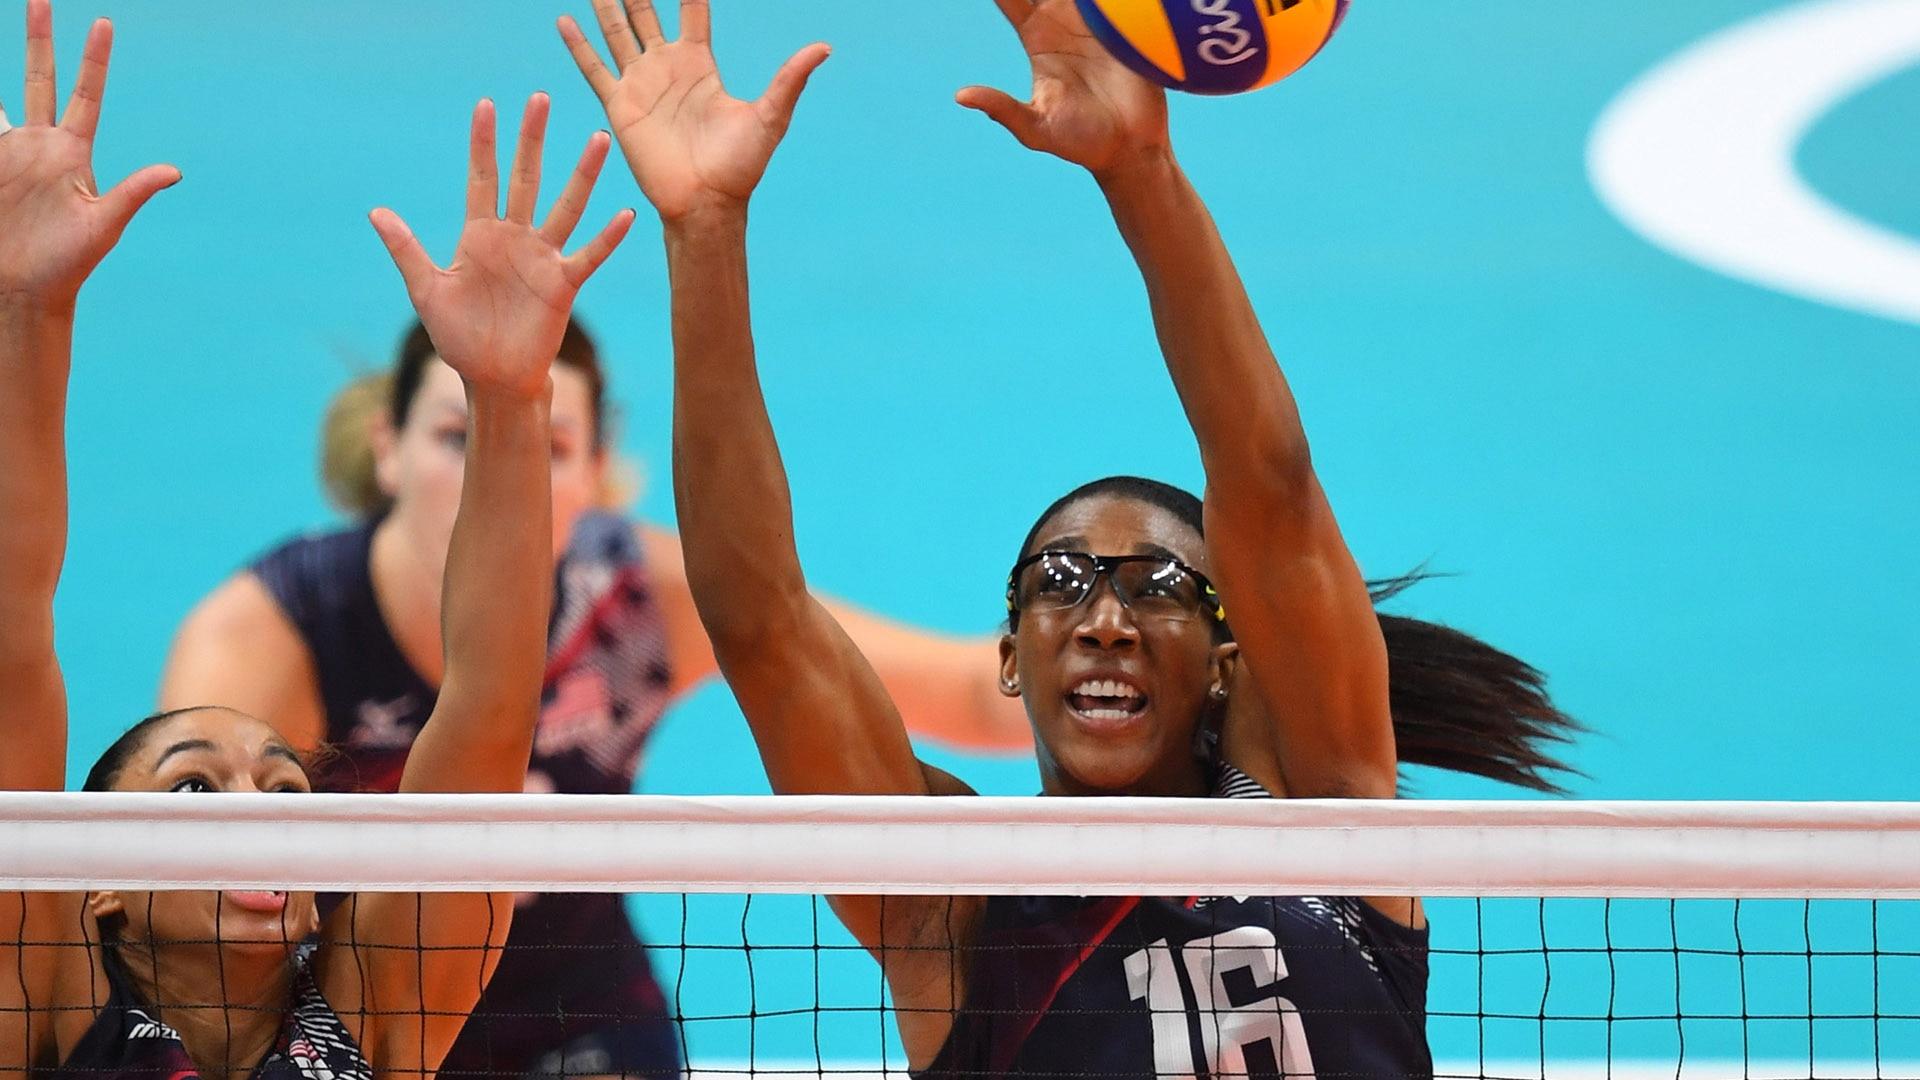 Foluke Akinradewo Gunderson at the 2016 Rio Olympics